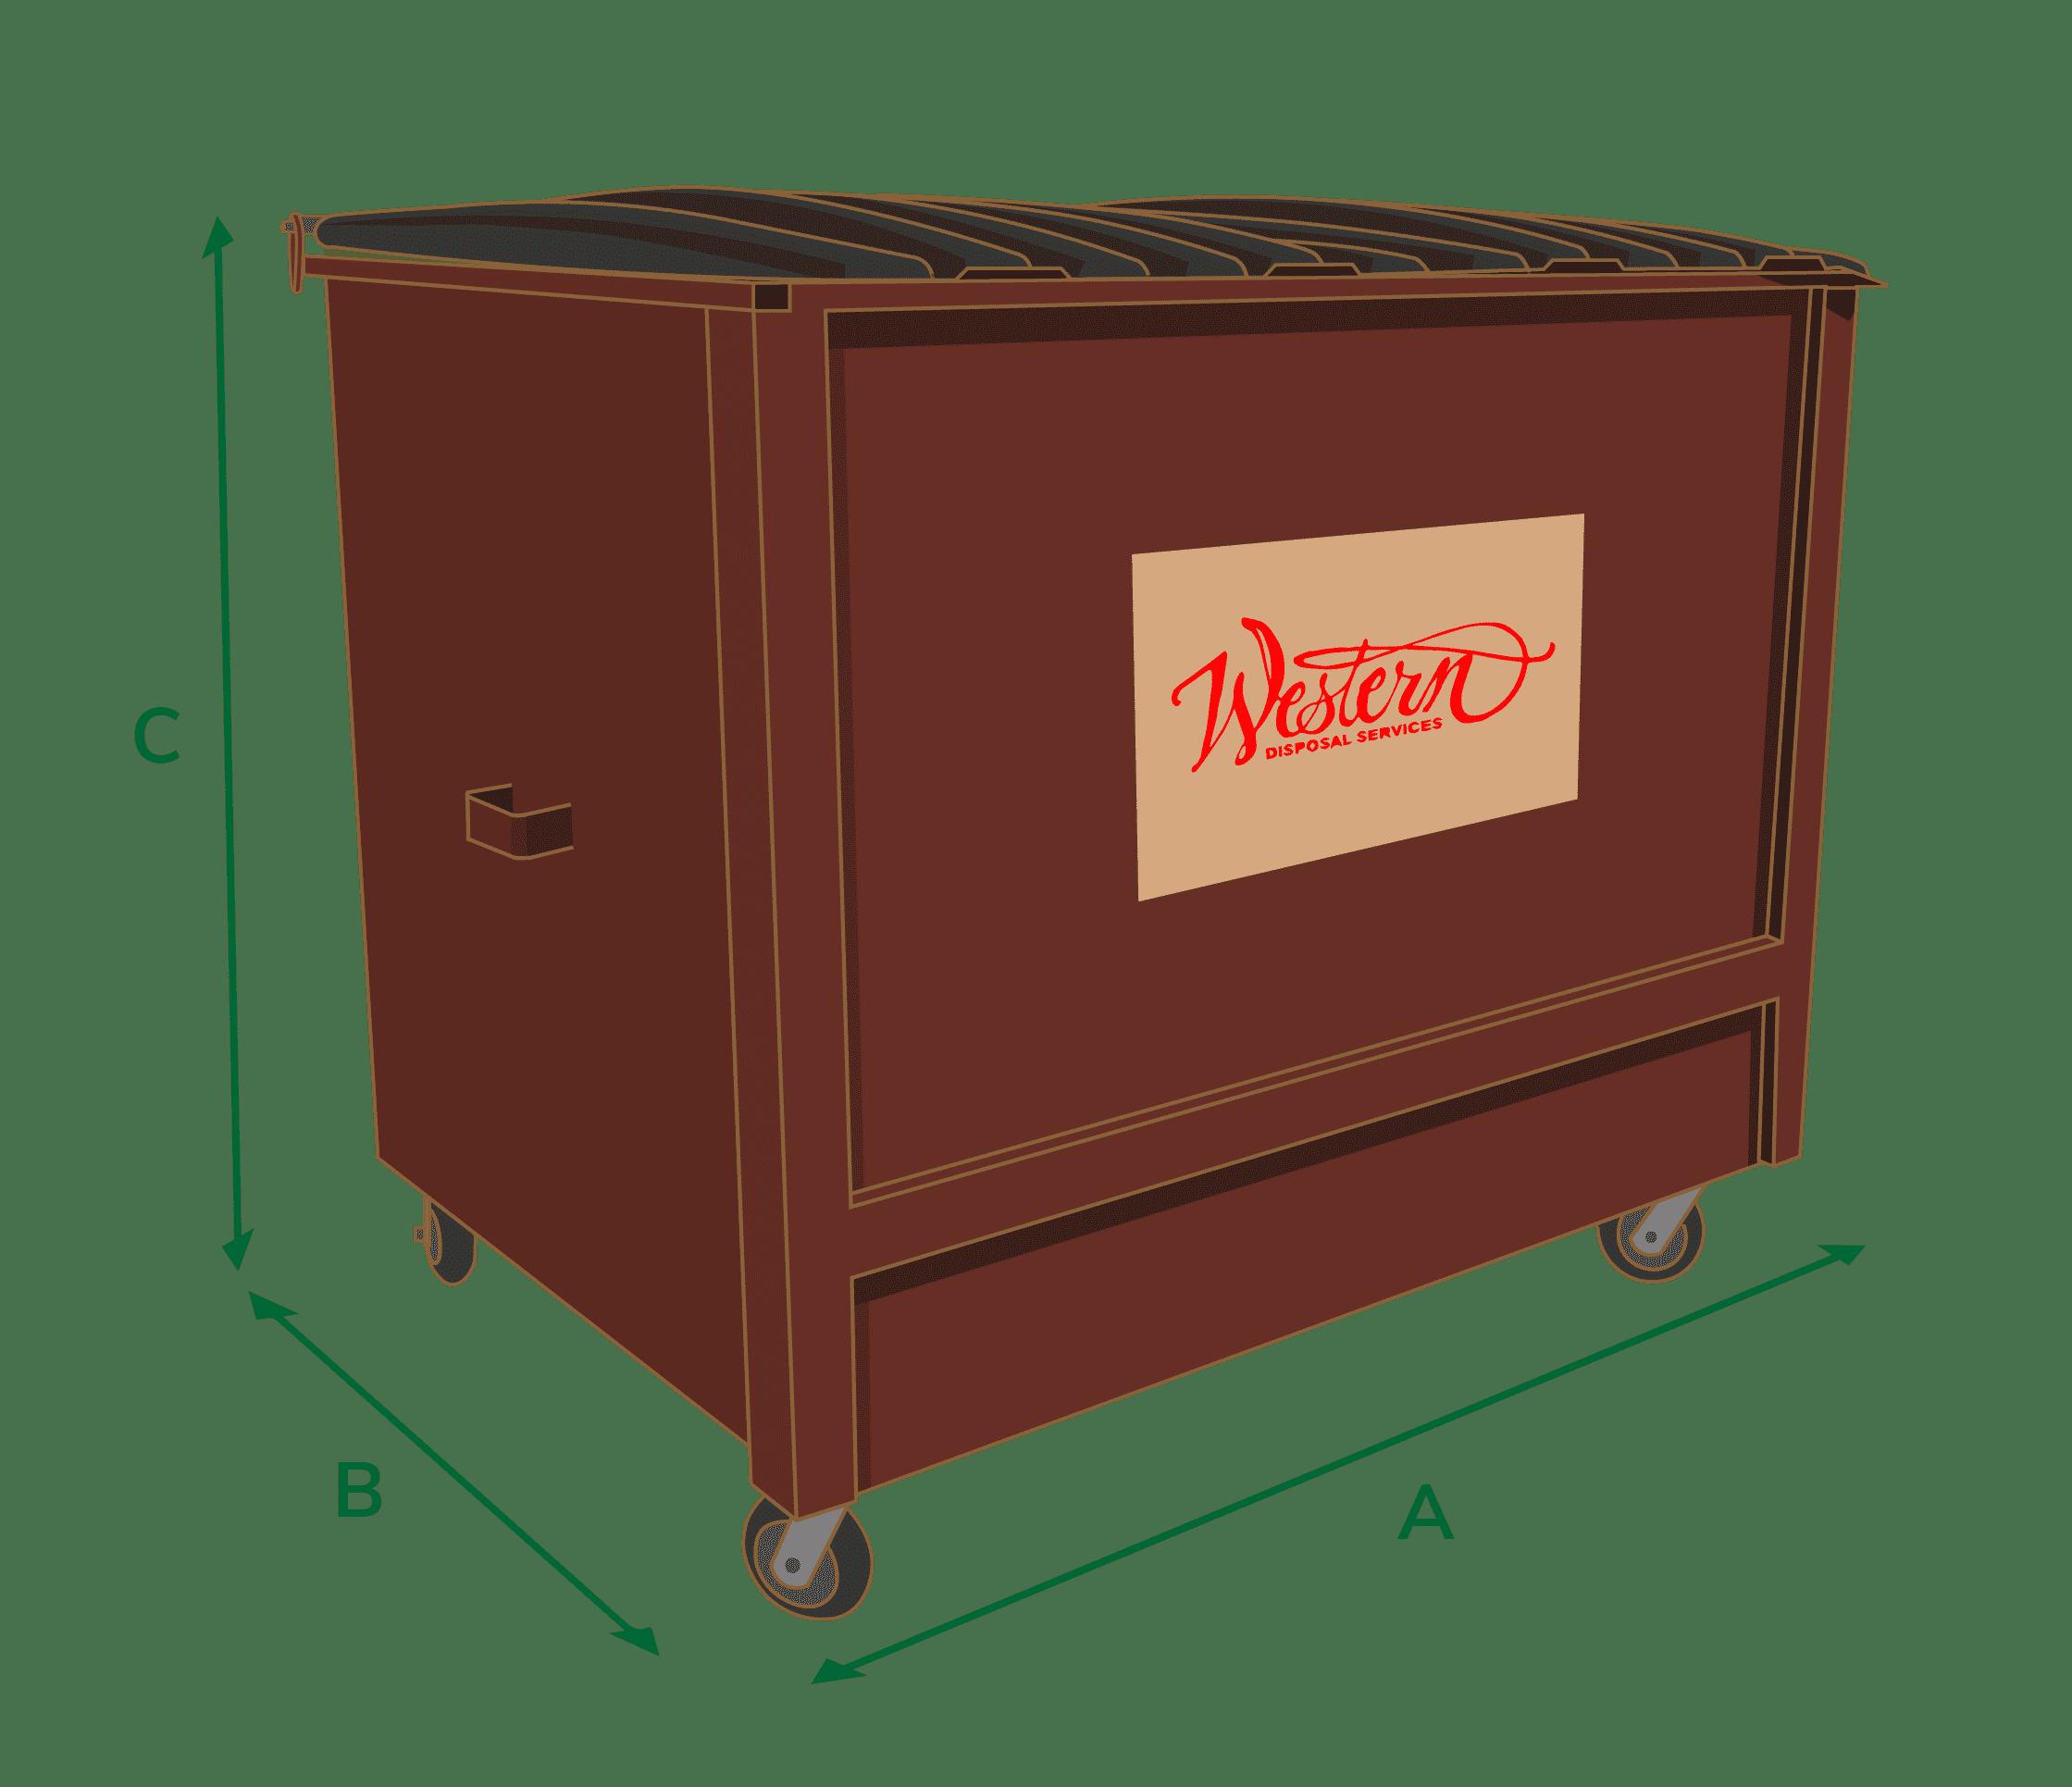 temporary dumpster rendering